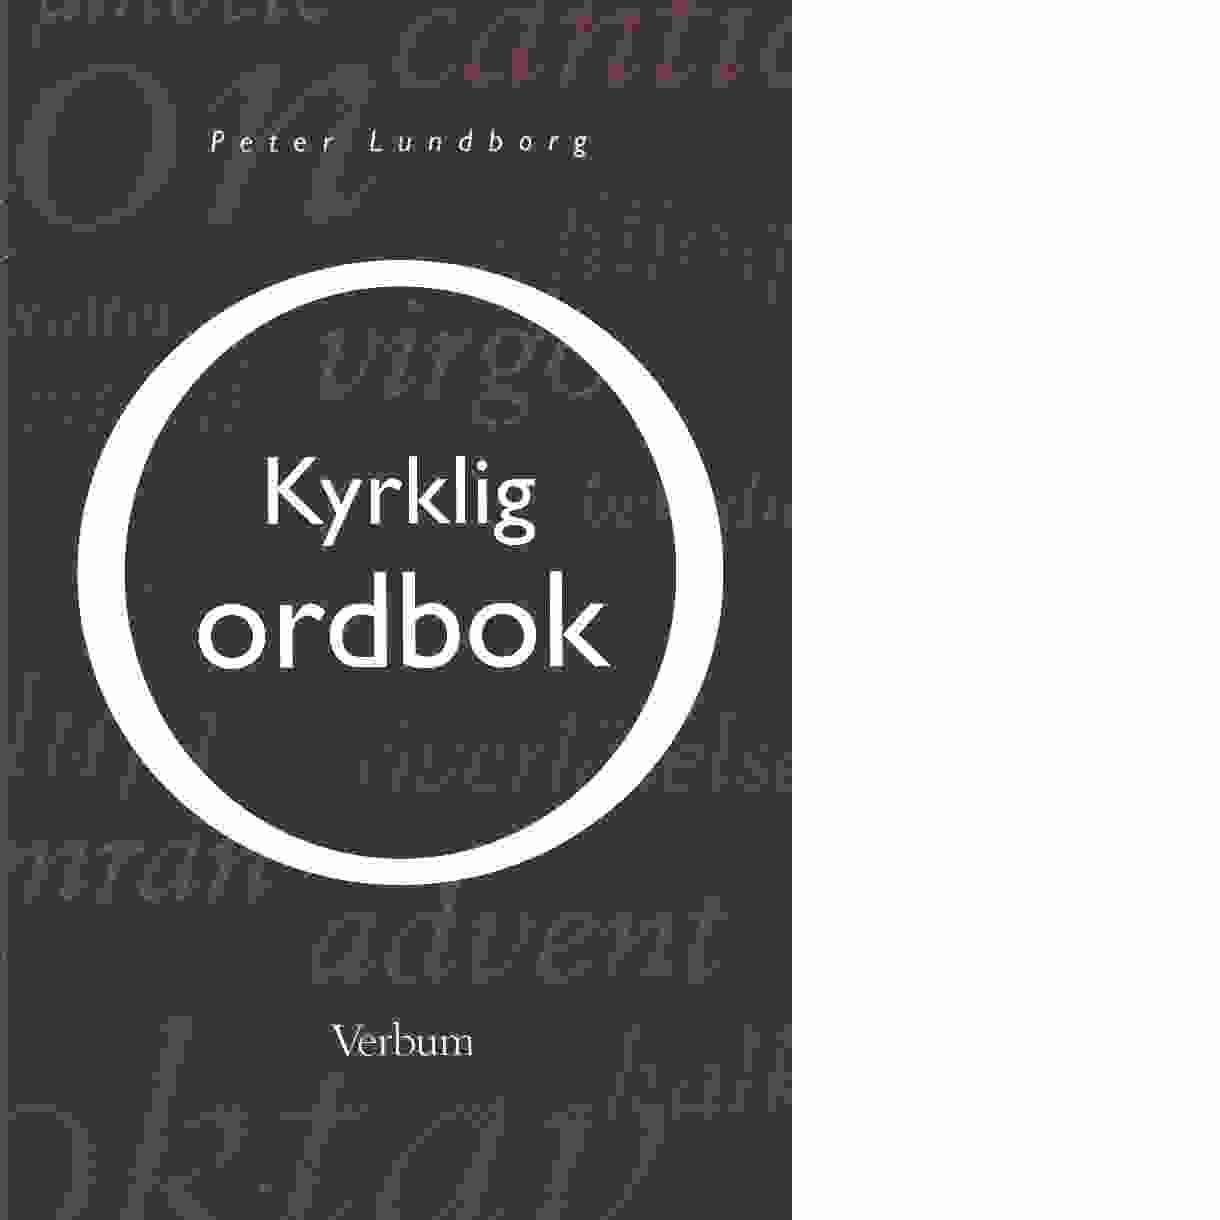 Kyrklig ordbok - Lundborg, Peter